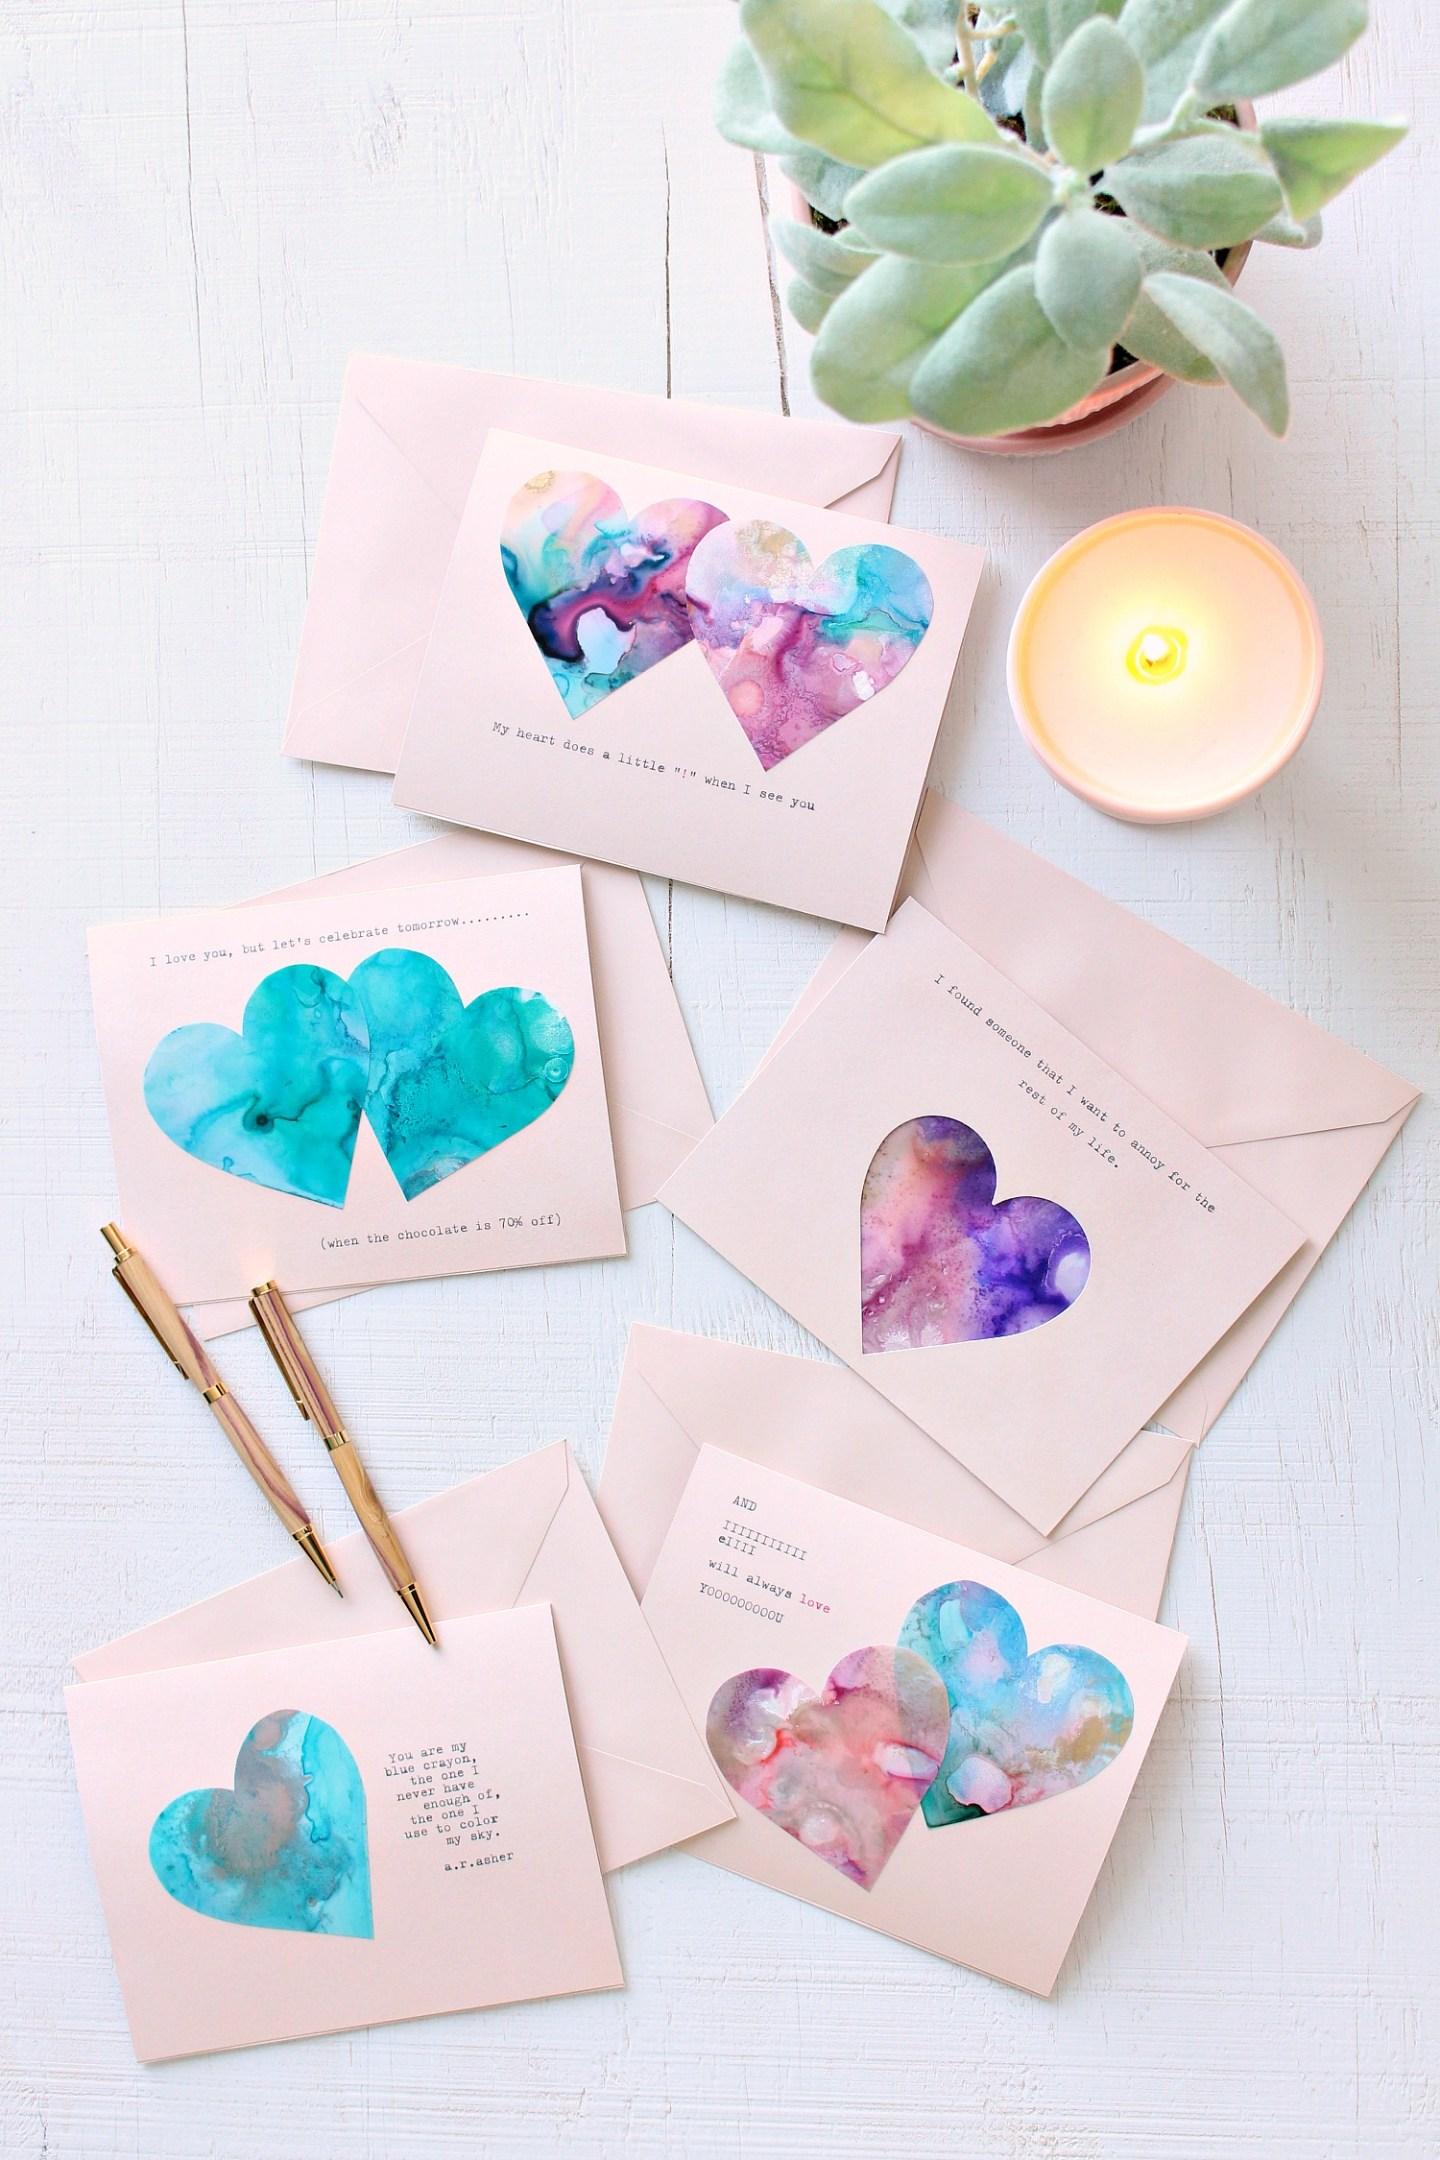 Last Minute Handmade Valentine's Day Cards